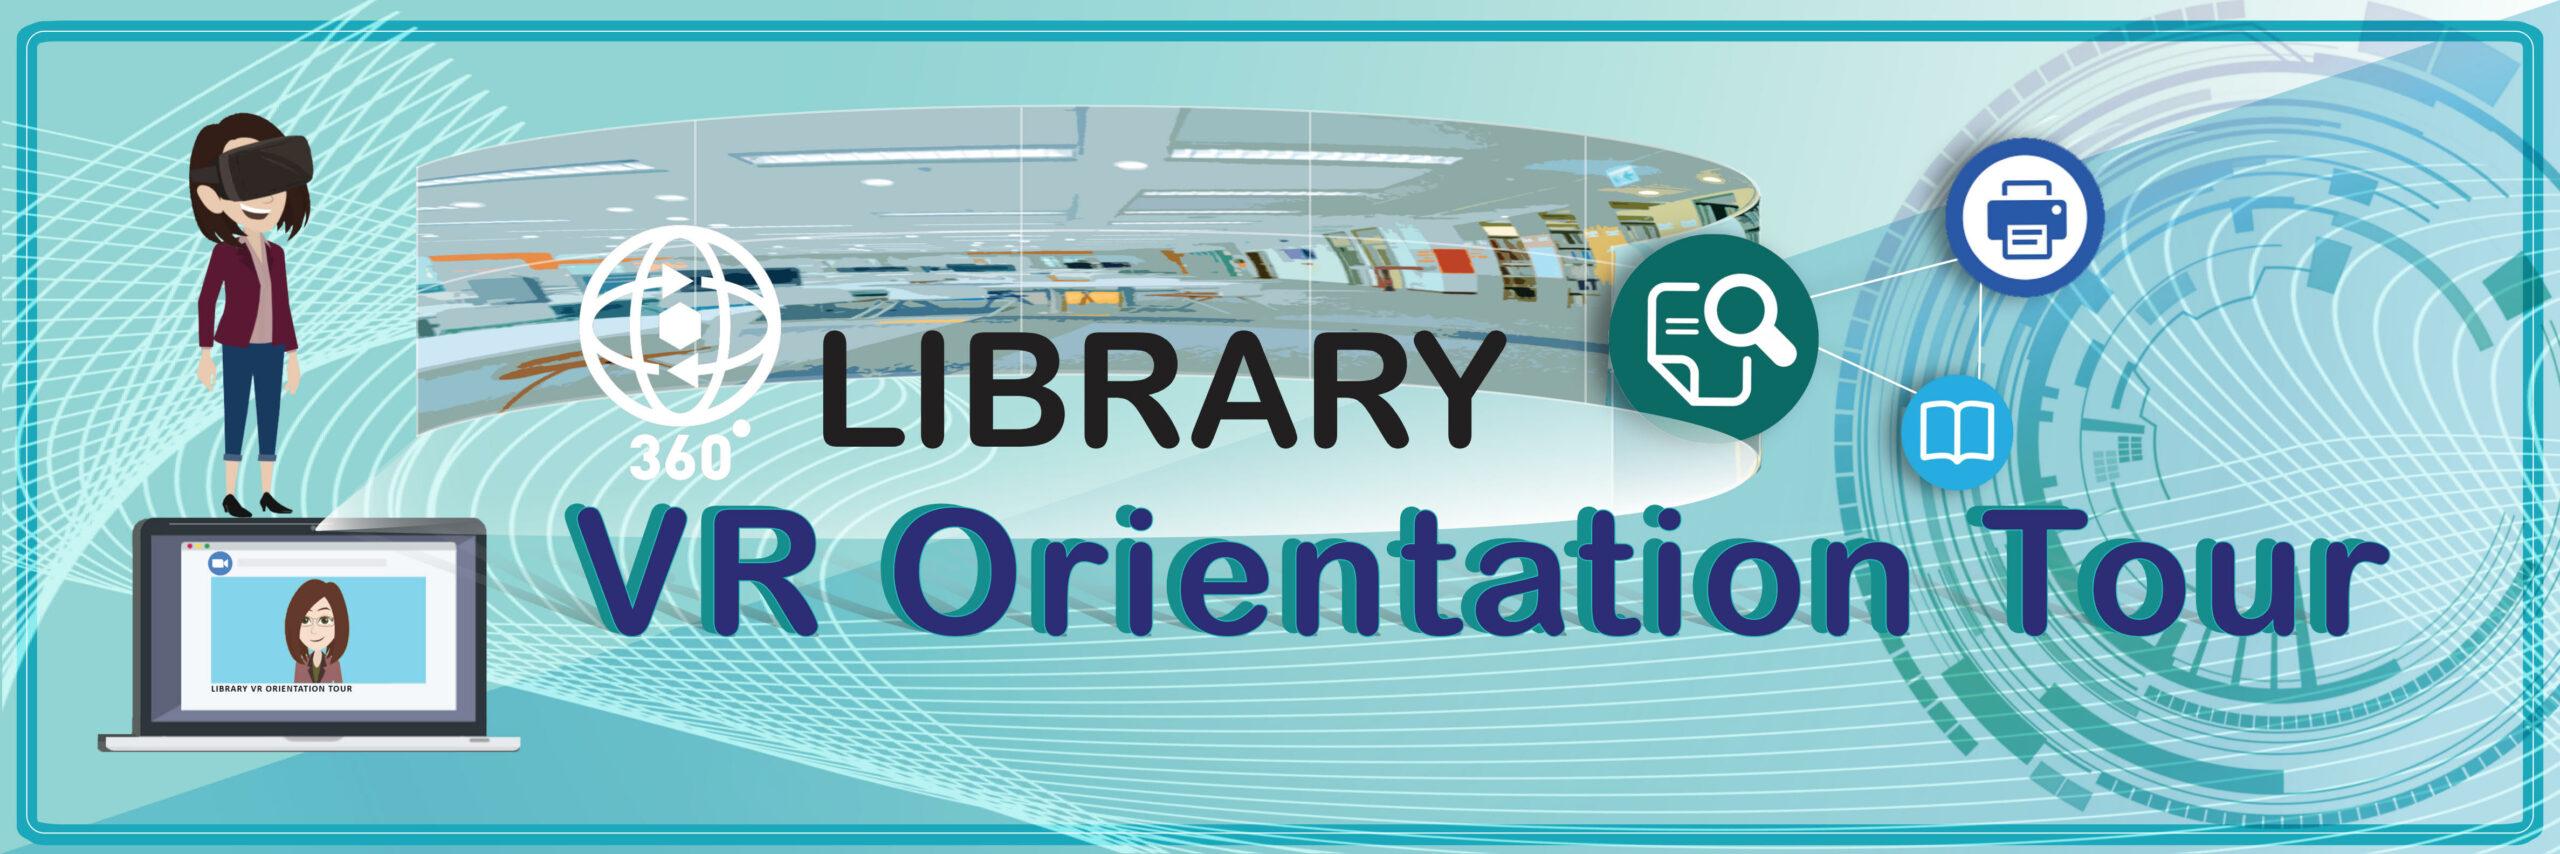 Library VR Orientation Tour